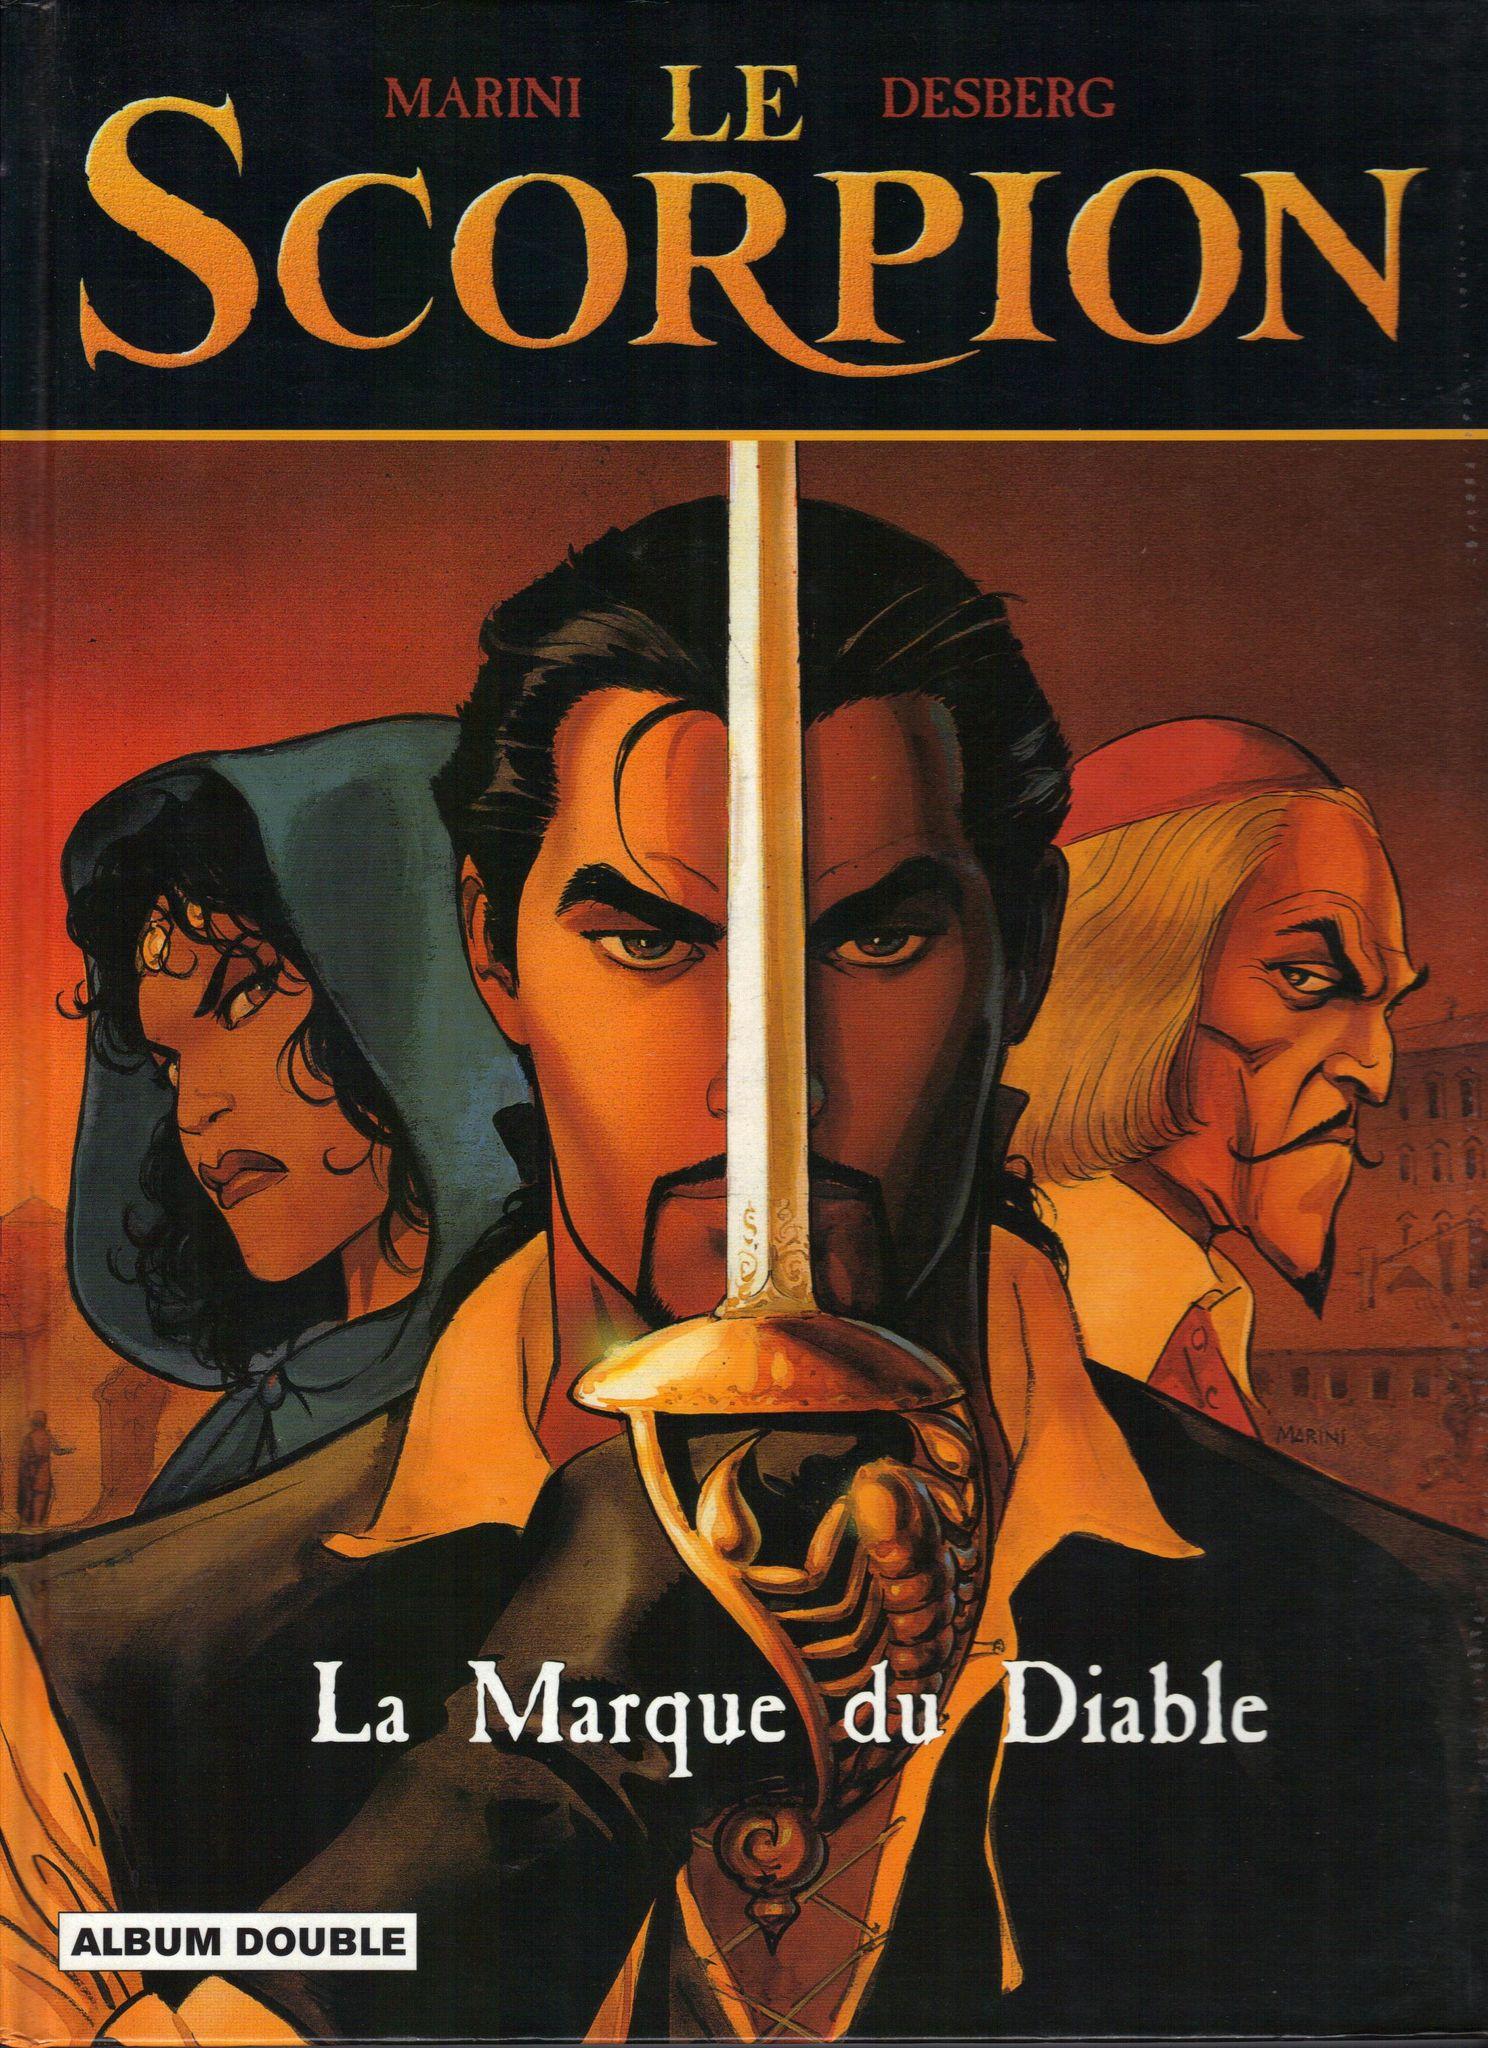 Le Scorpion volume 1